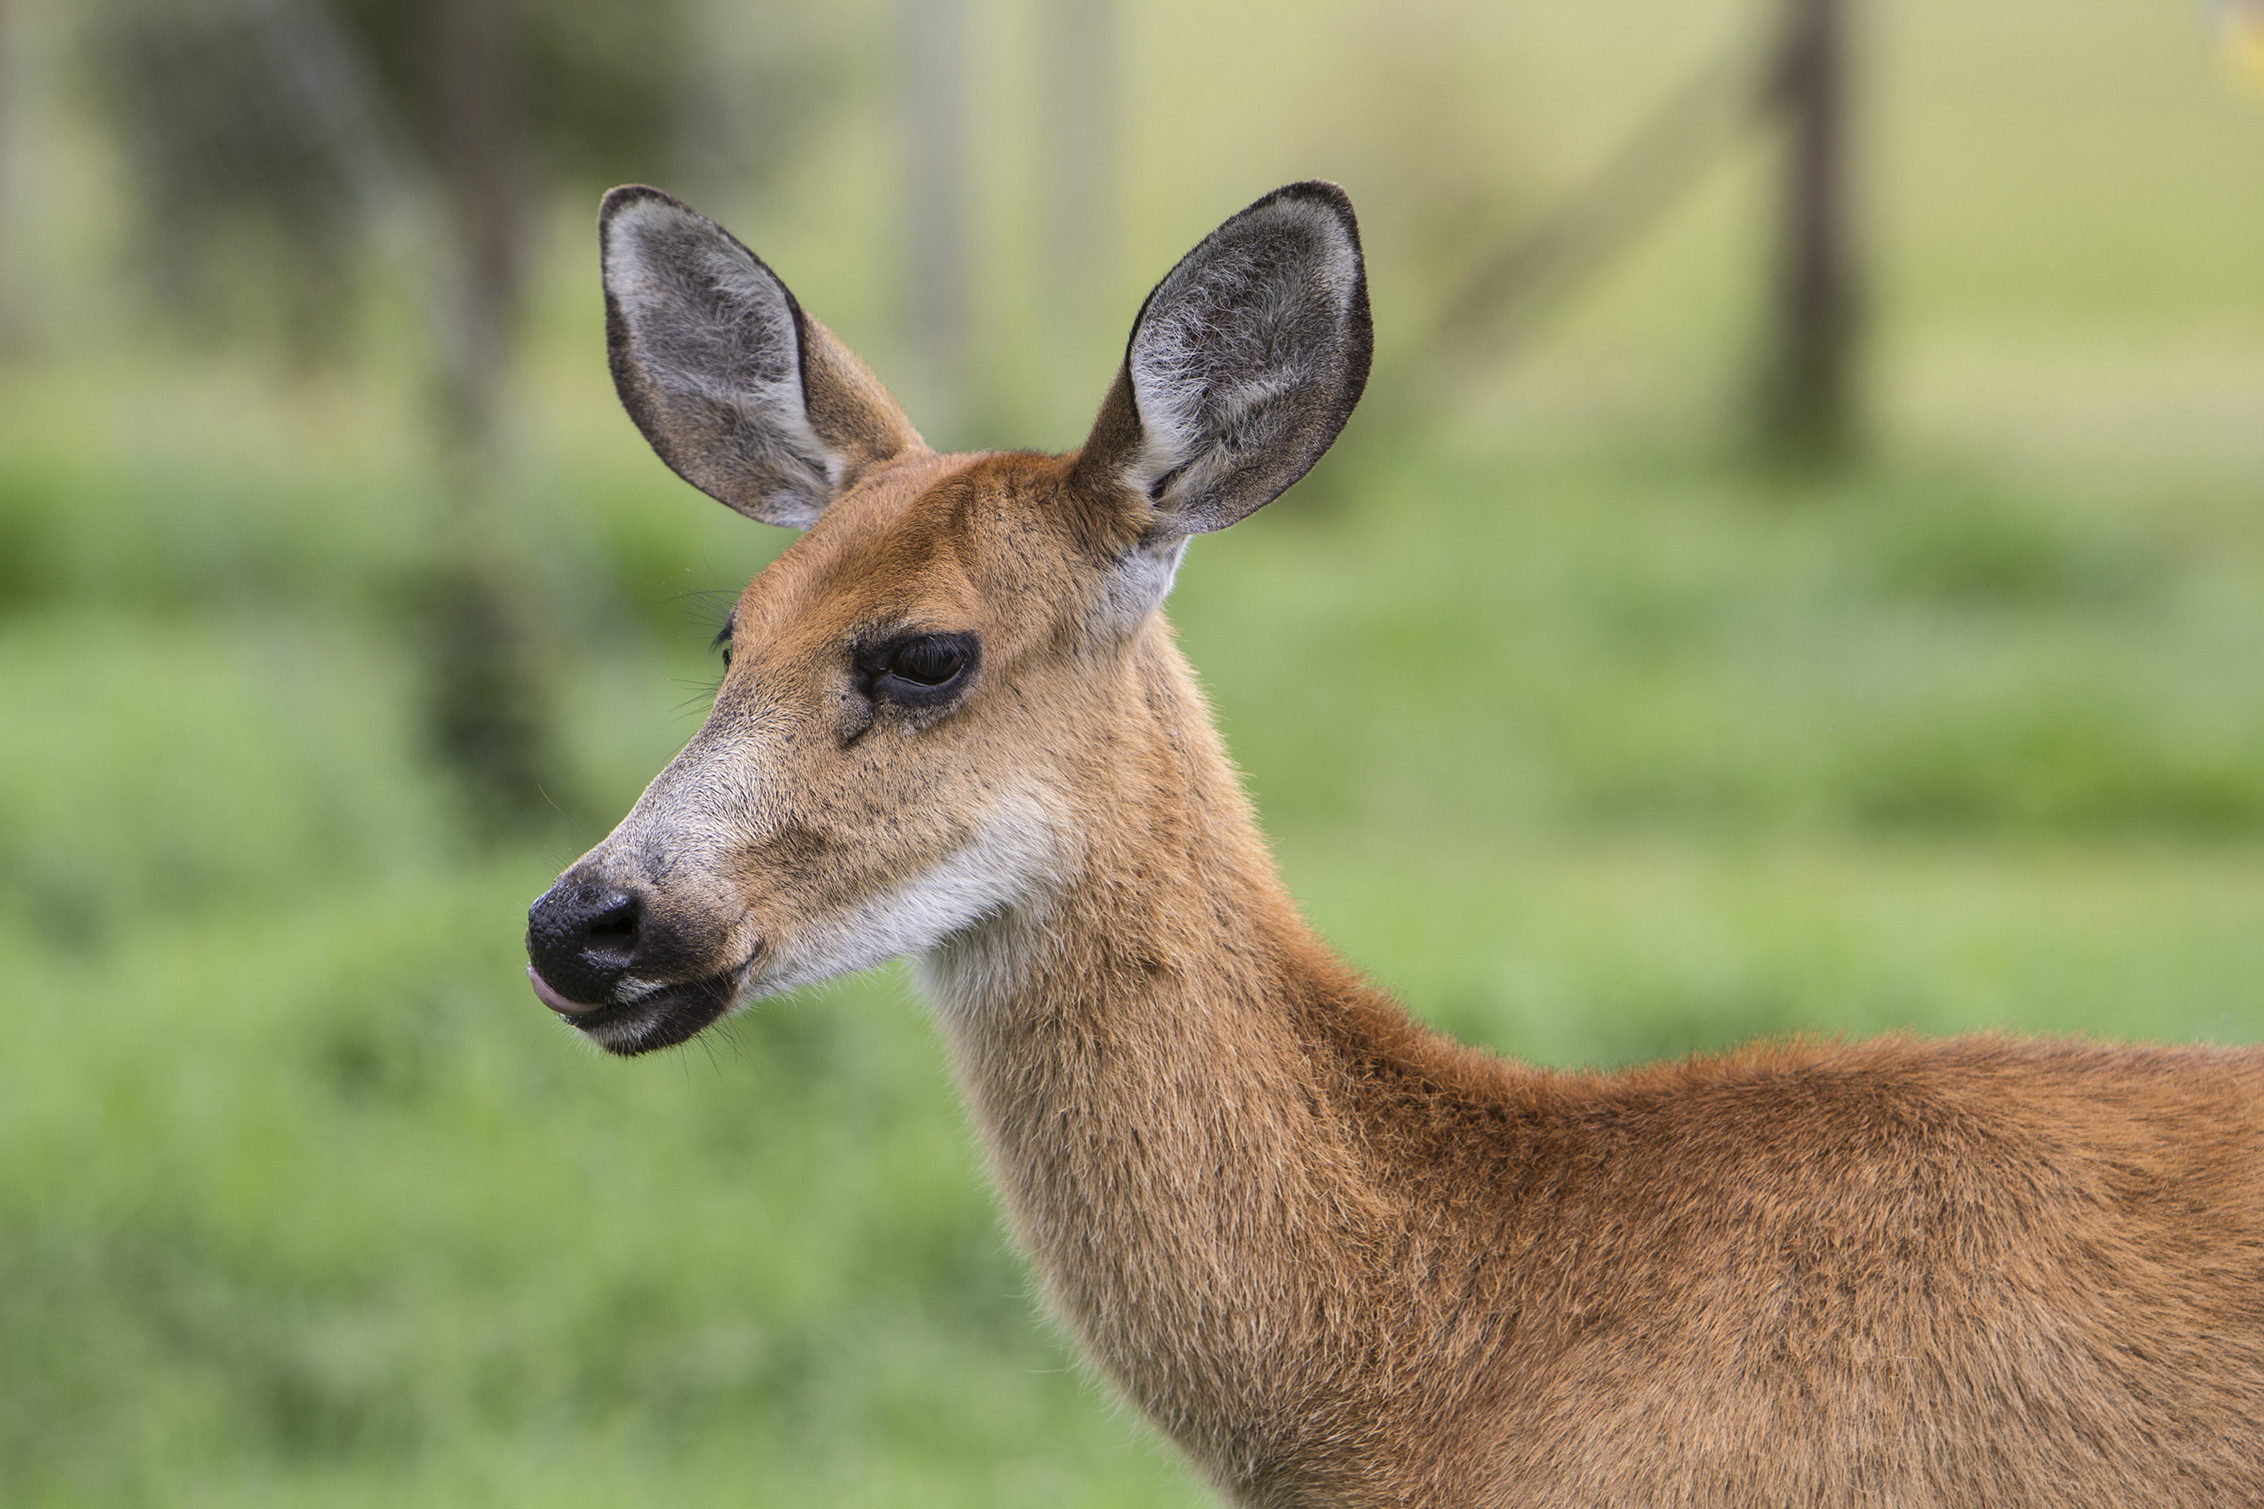 What Size Deer Antler Shouls My Dog Get